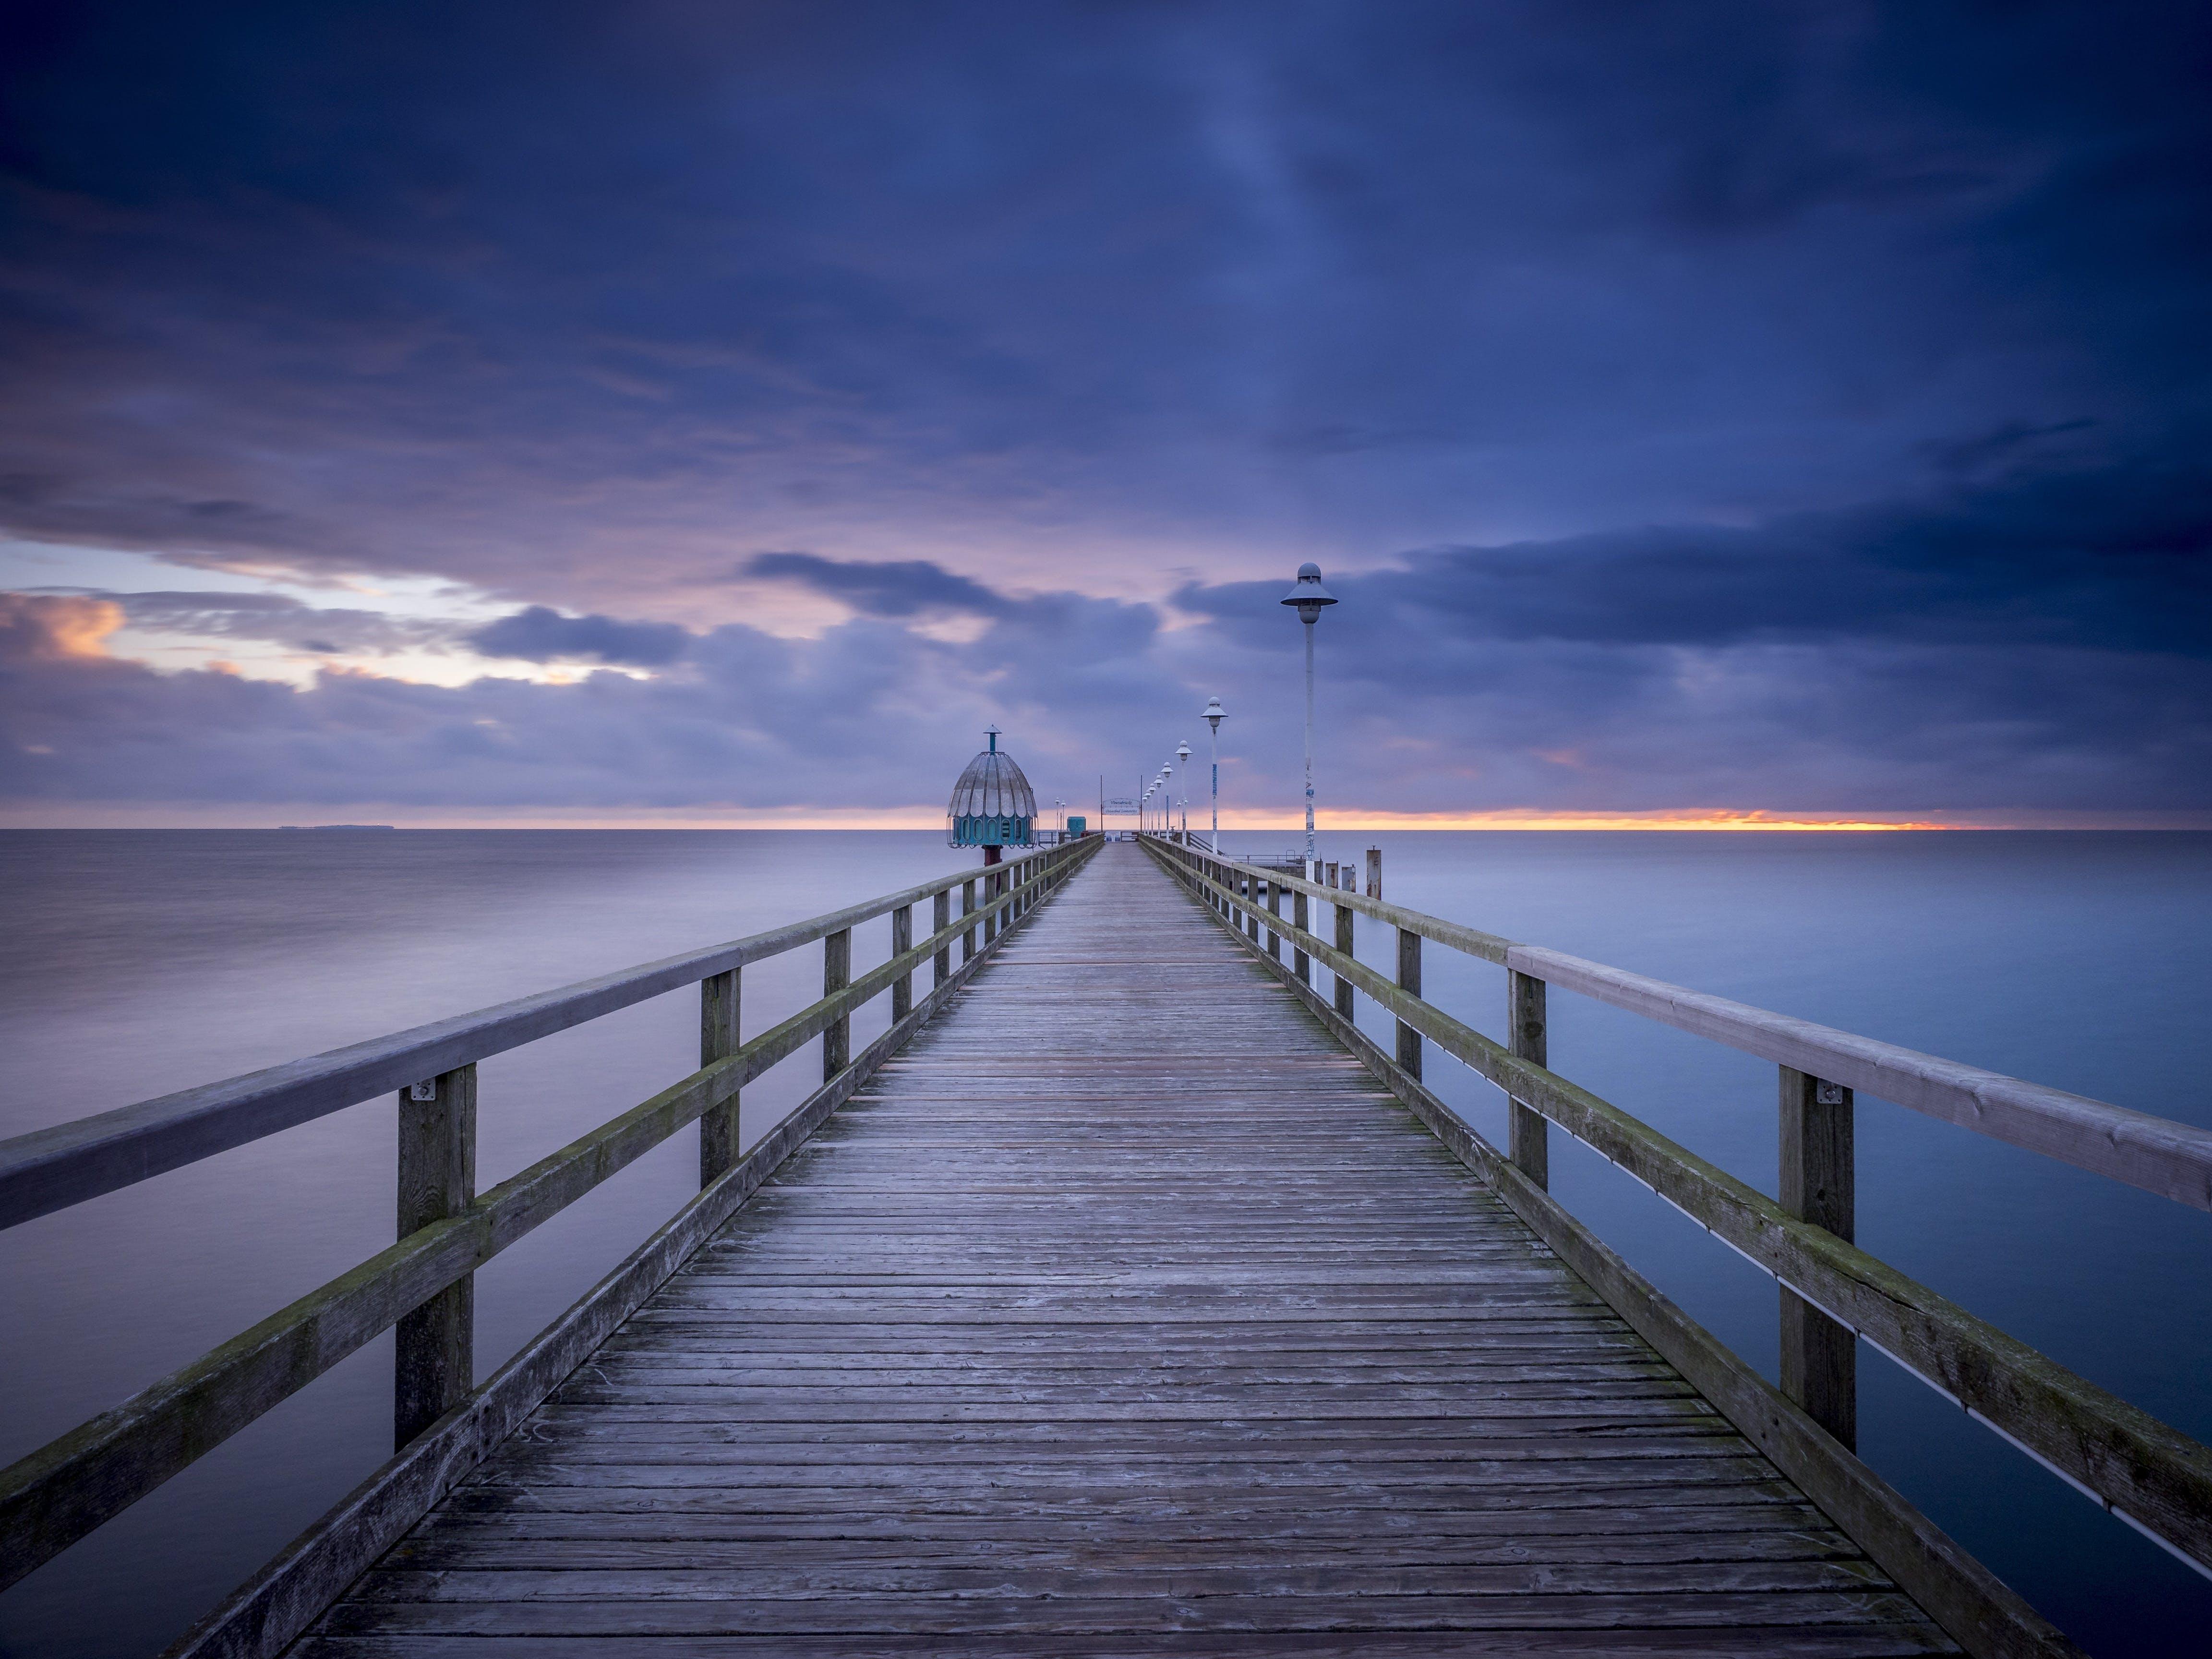 Безкоштовне стокове фото на тему «вечір, горизонт, довга експозиція, док»